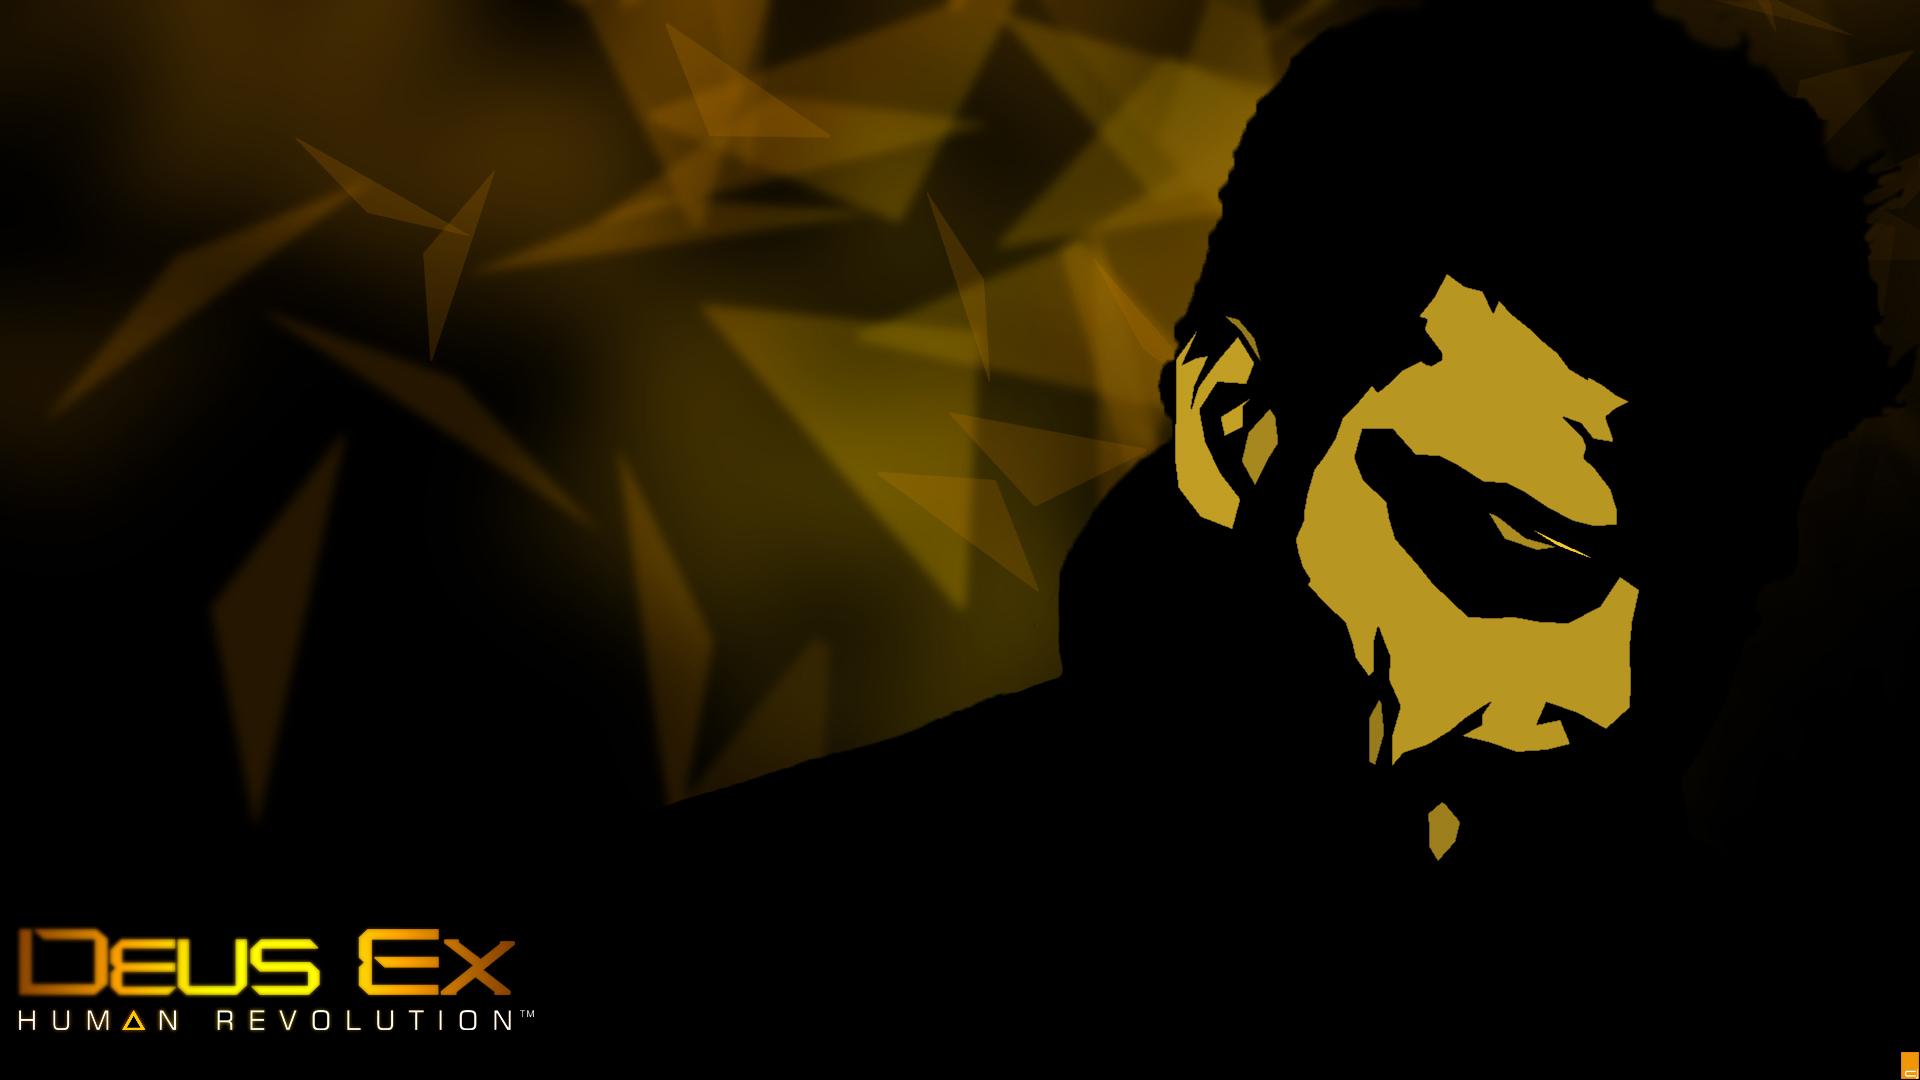 Deus Ex Human Revolution new wallpaper HD wallpapers and images 1920x1080